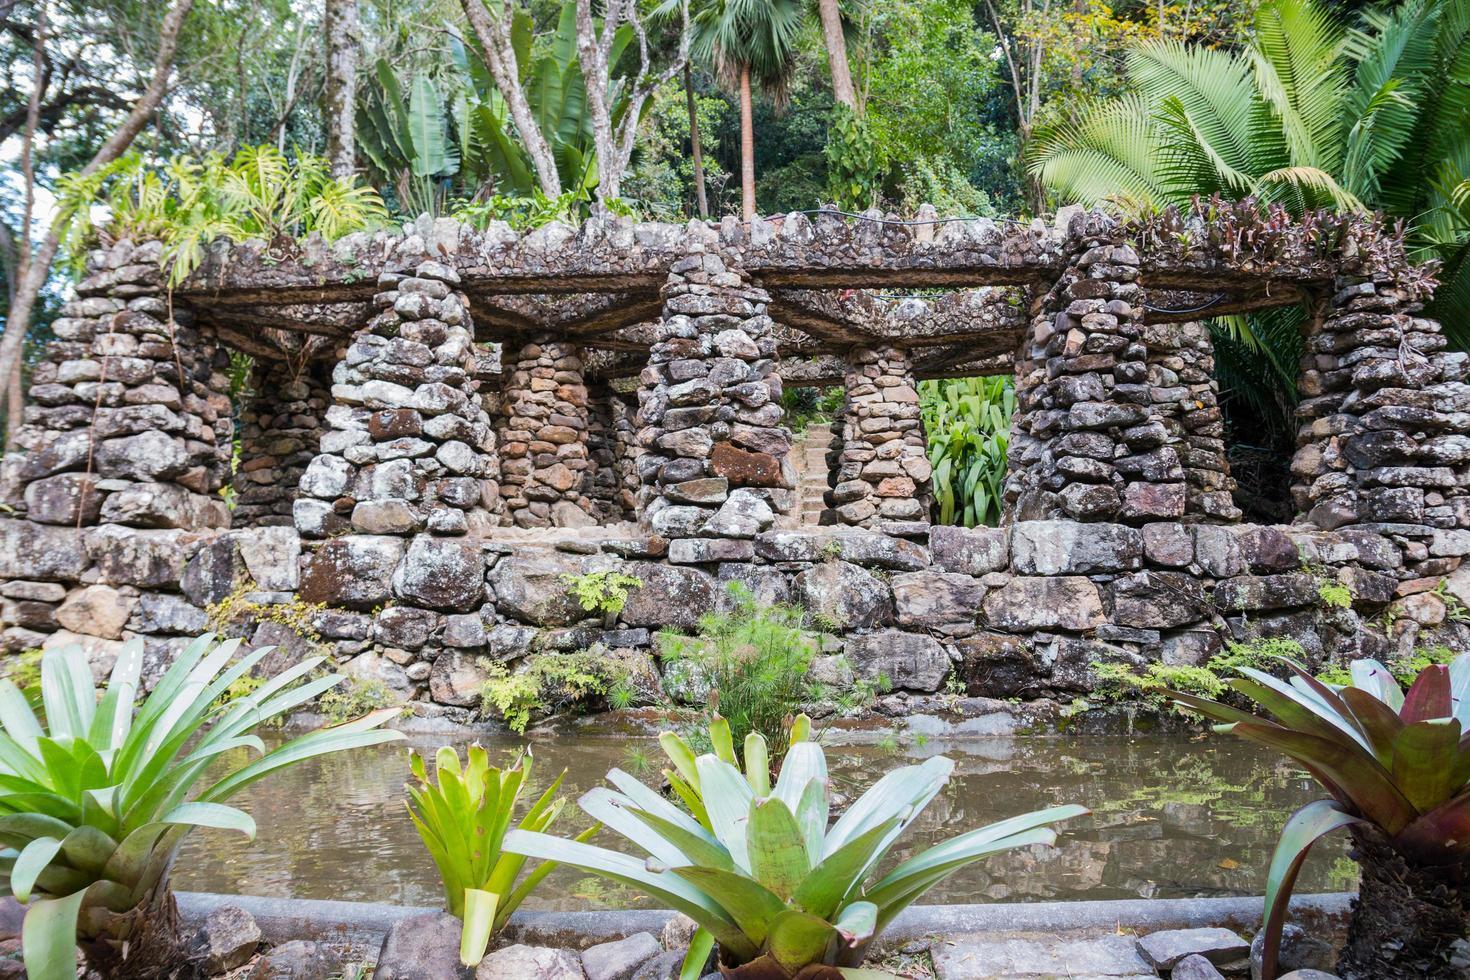 rio de janeiro, brasile, 2015 - vista sul giardino botanico foto